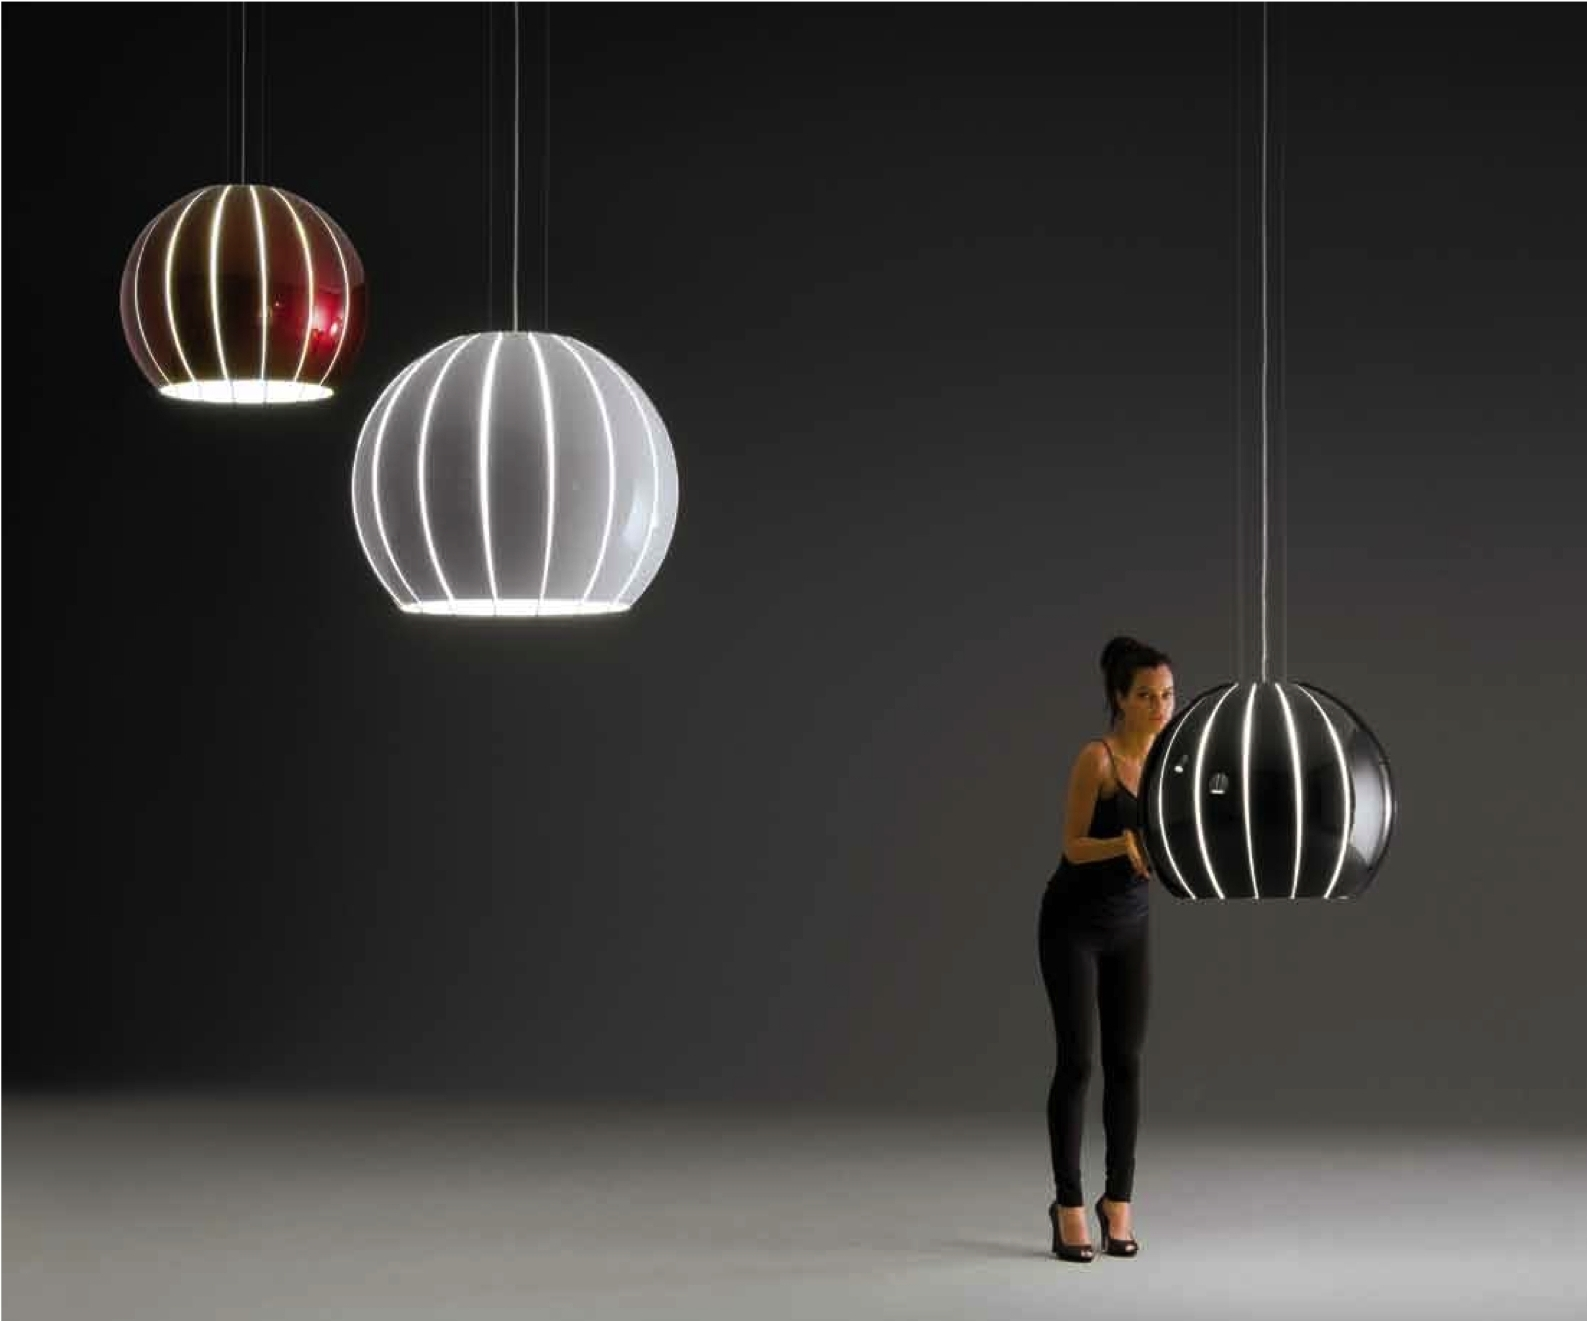 Most Recent Decor: Modern Home Lighting Fixture Ideas With Modern Pendant With Regard To Modern Pendant Lighting Fixtures (View 10 of 20)